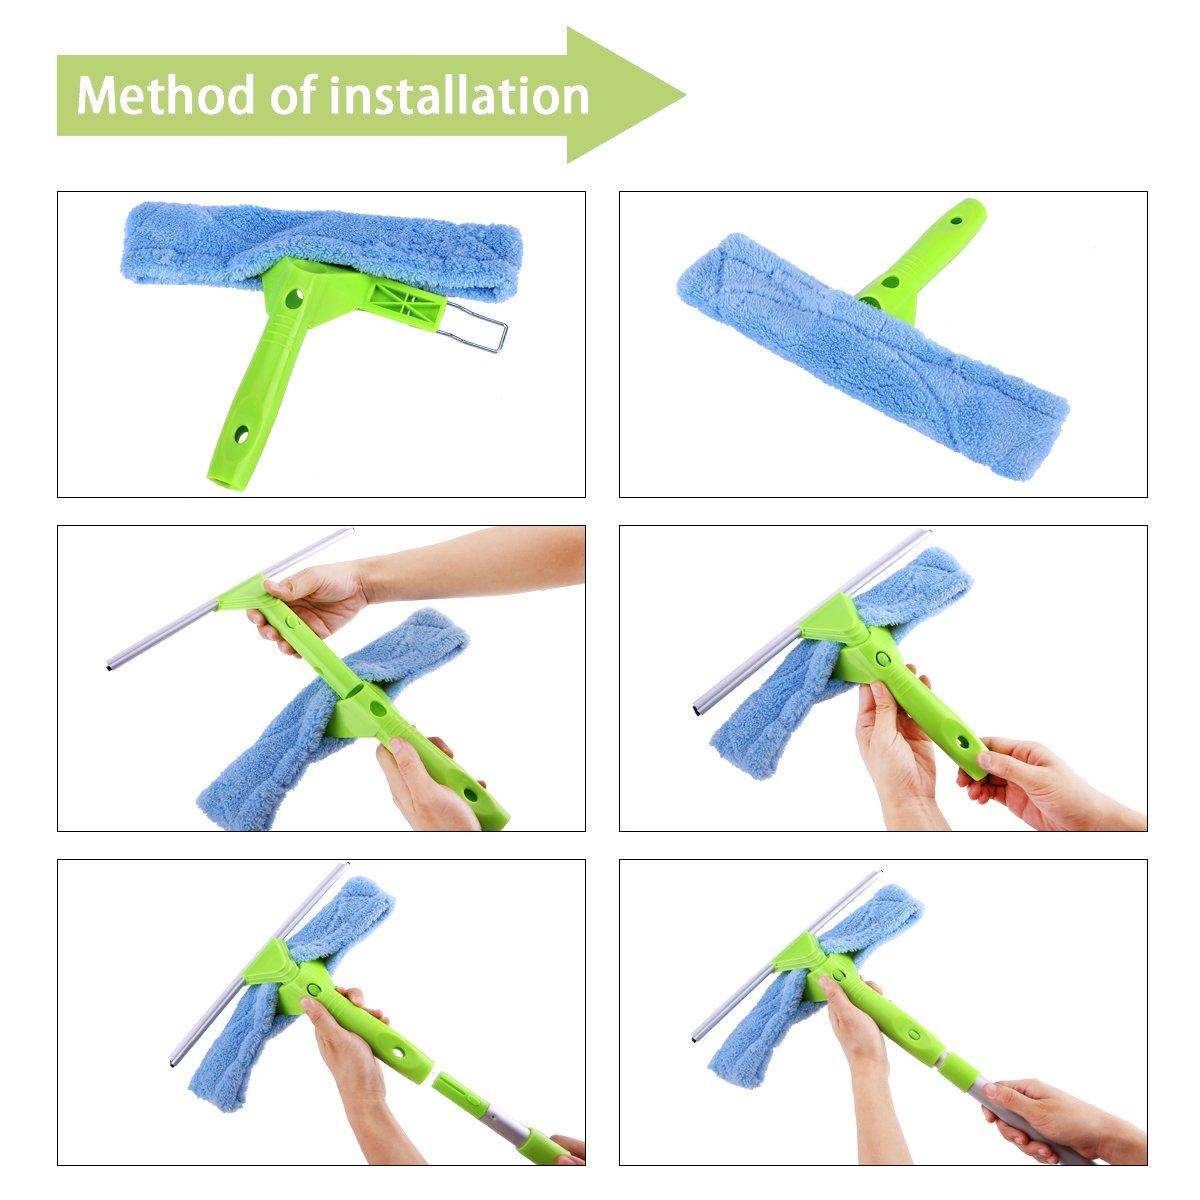 Amazon.com: Limpiador telescópico para ventanas 3 en 1 Kit ...